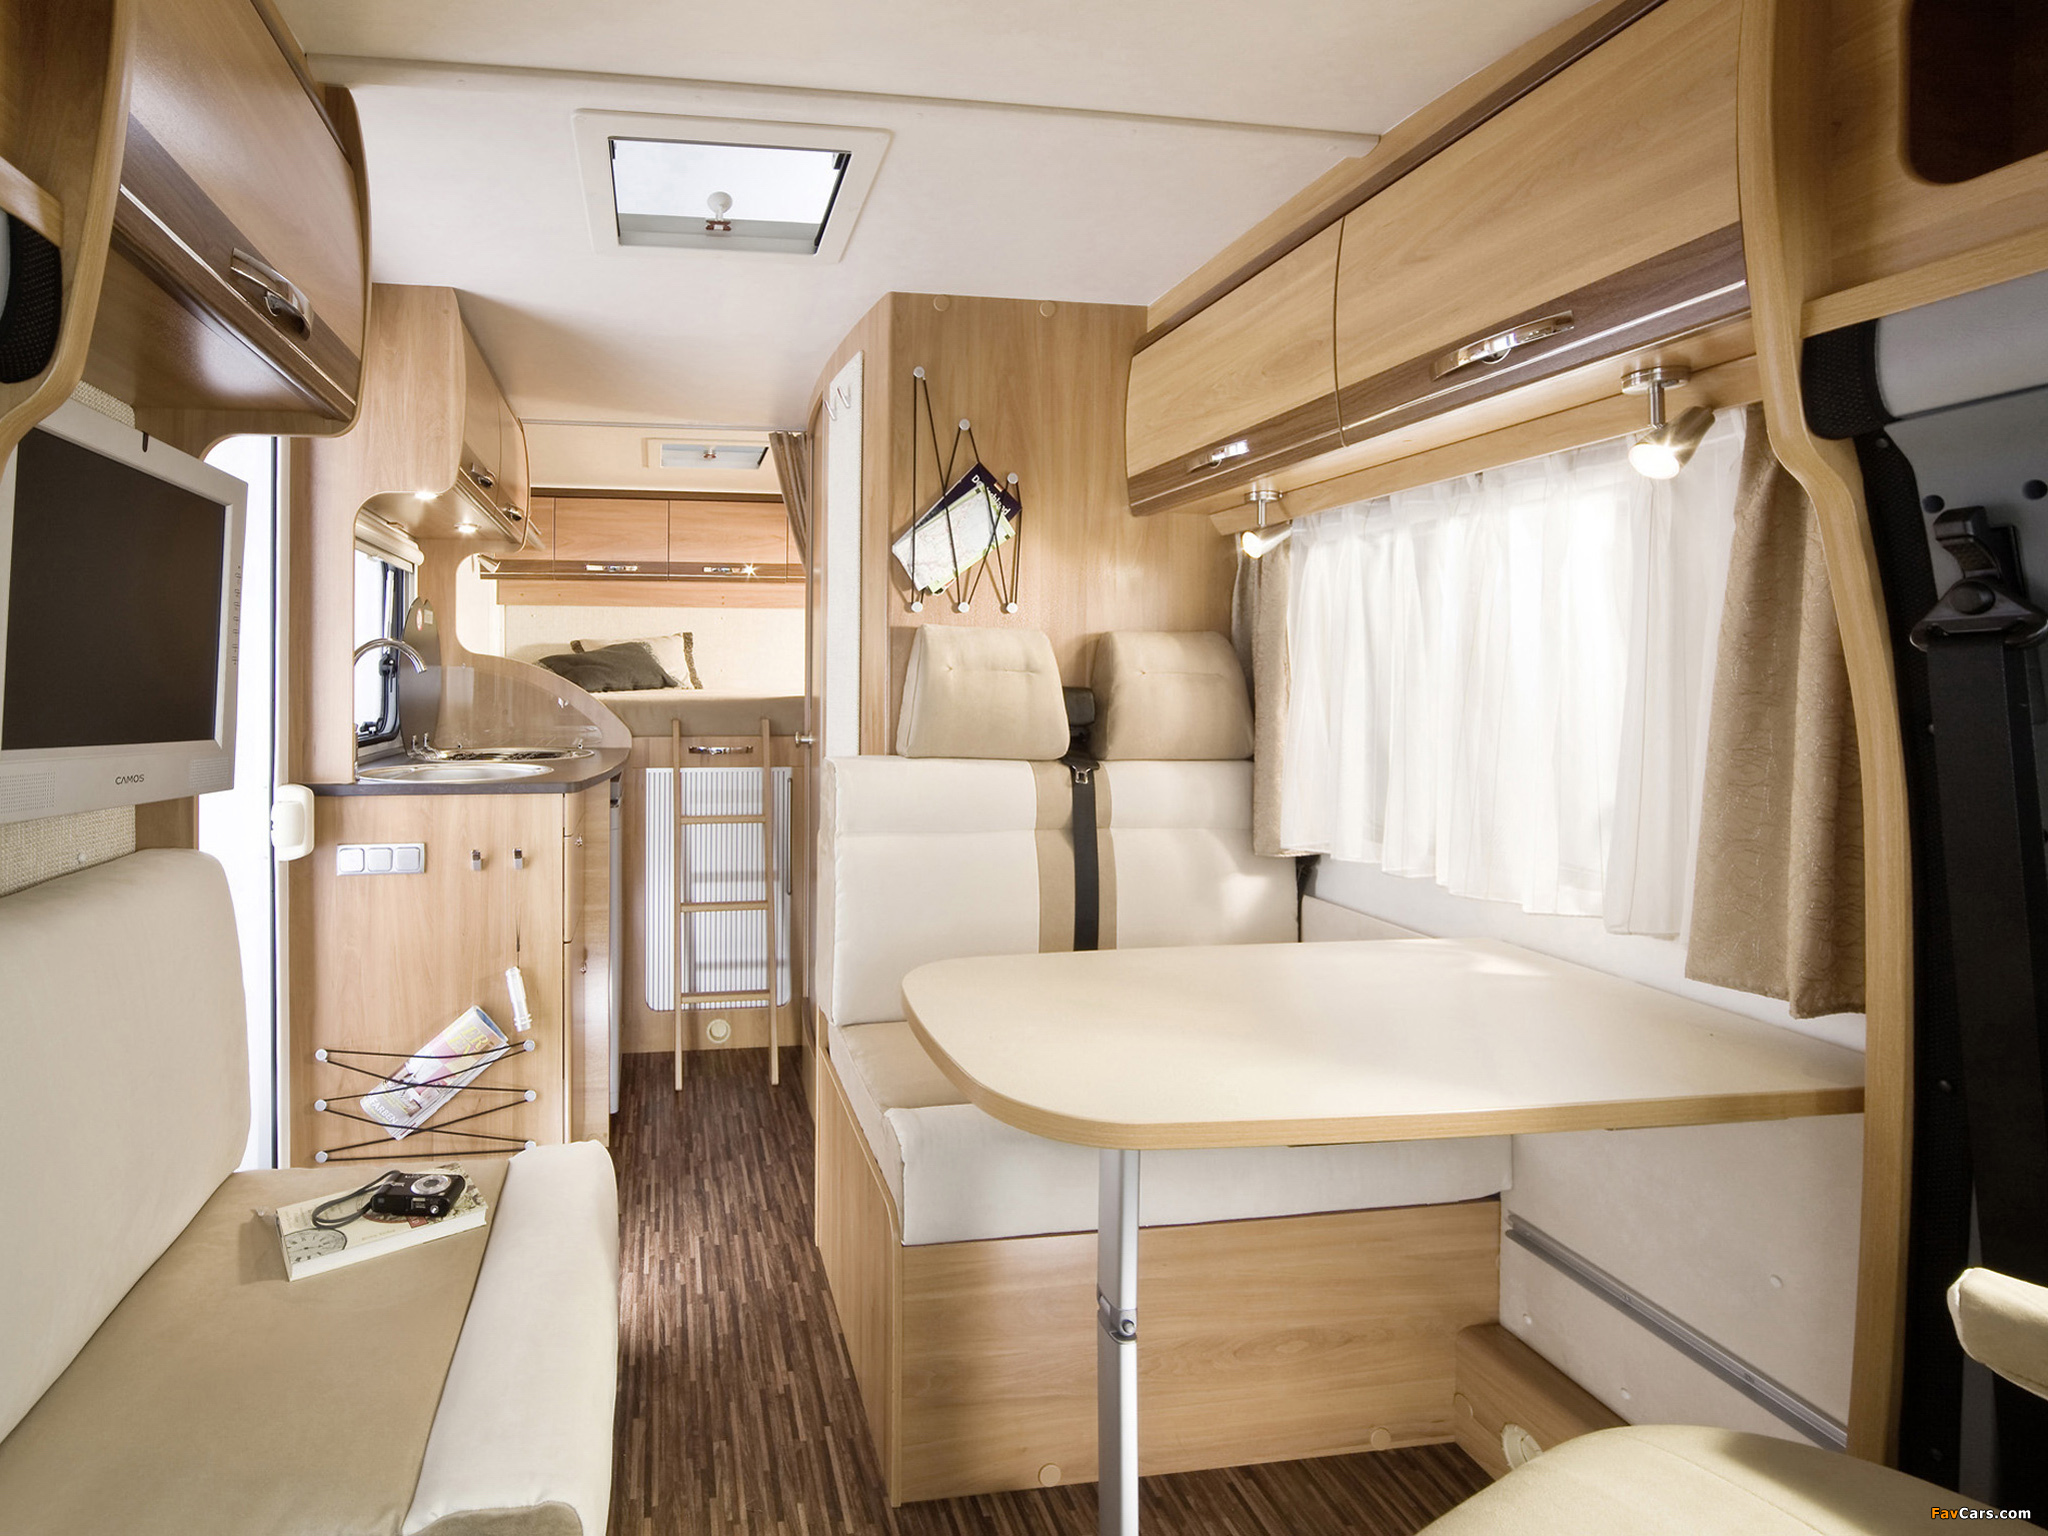 pictures of hymer van 512 silverline 2009 2048x1536. Black Bedroom Furniture Sets. Home Design Ideas